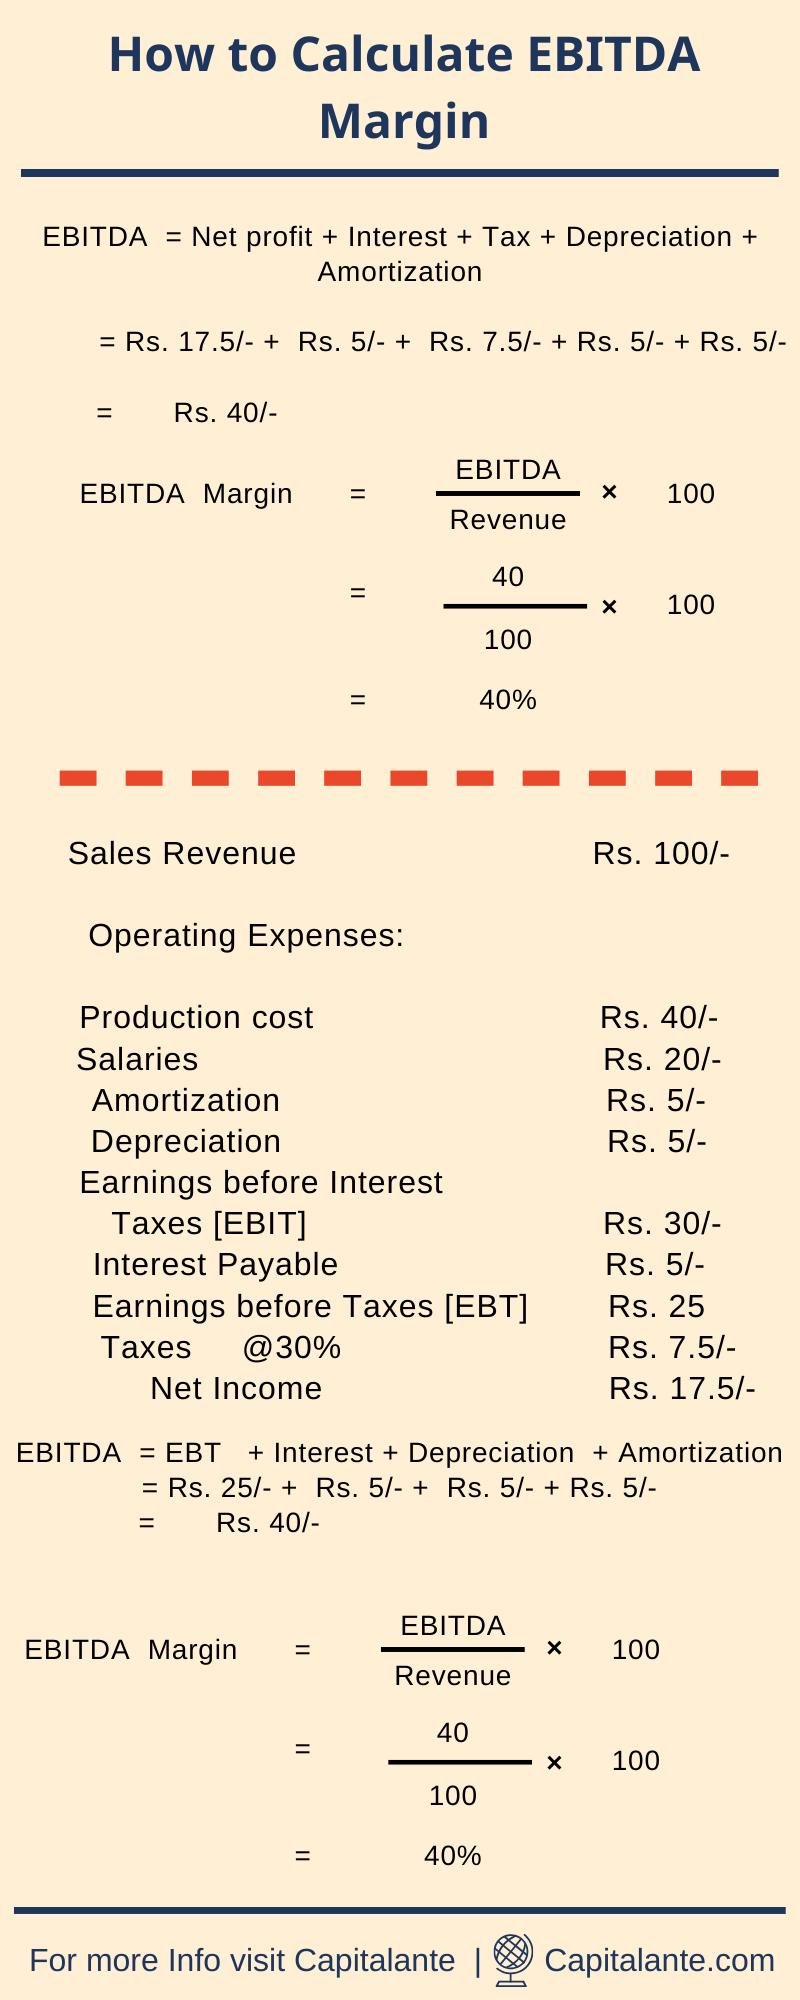 How to calculate EBITDA Margin